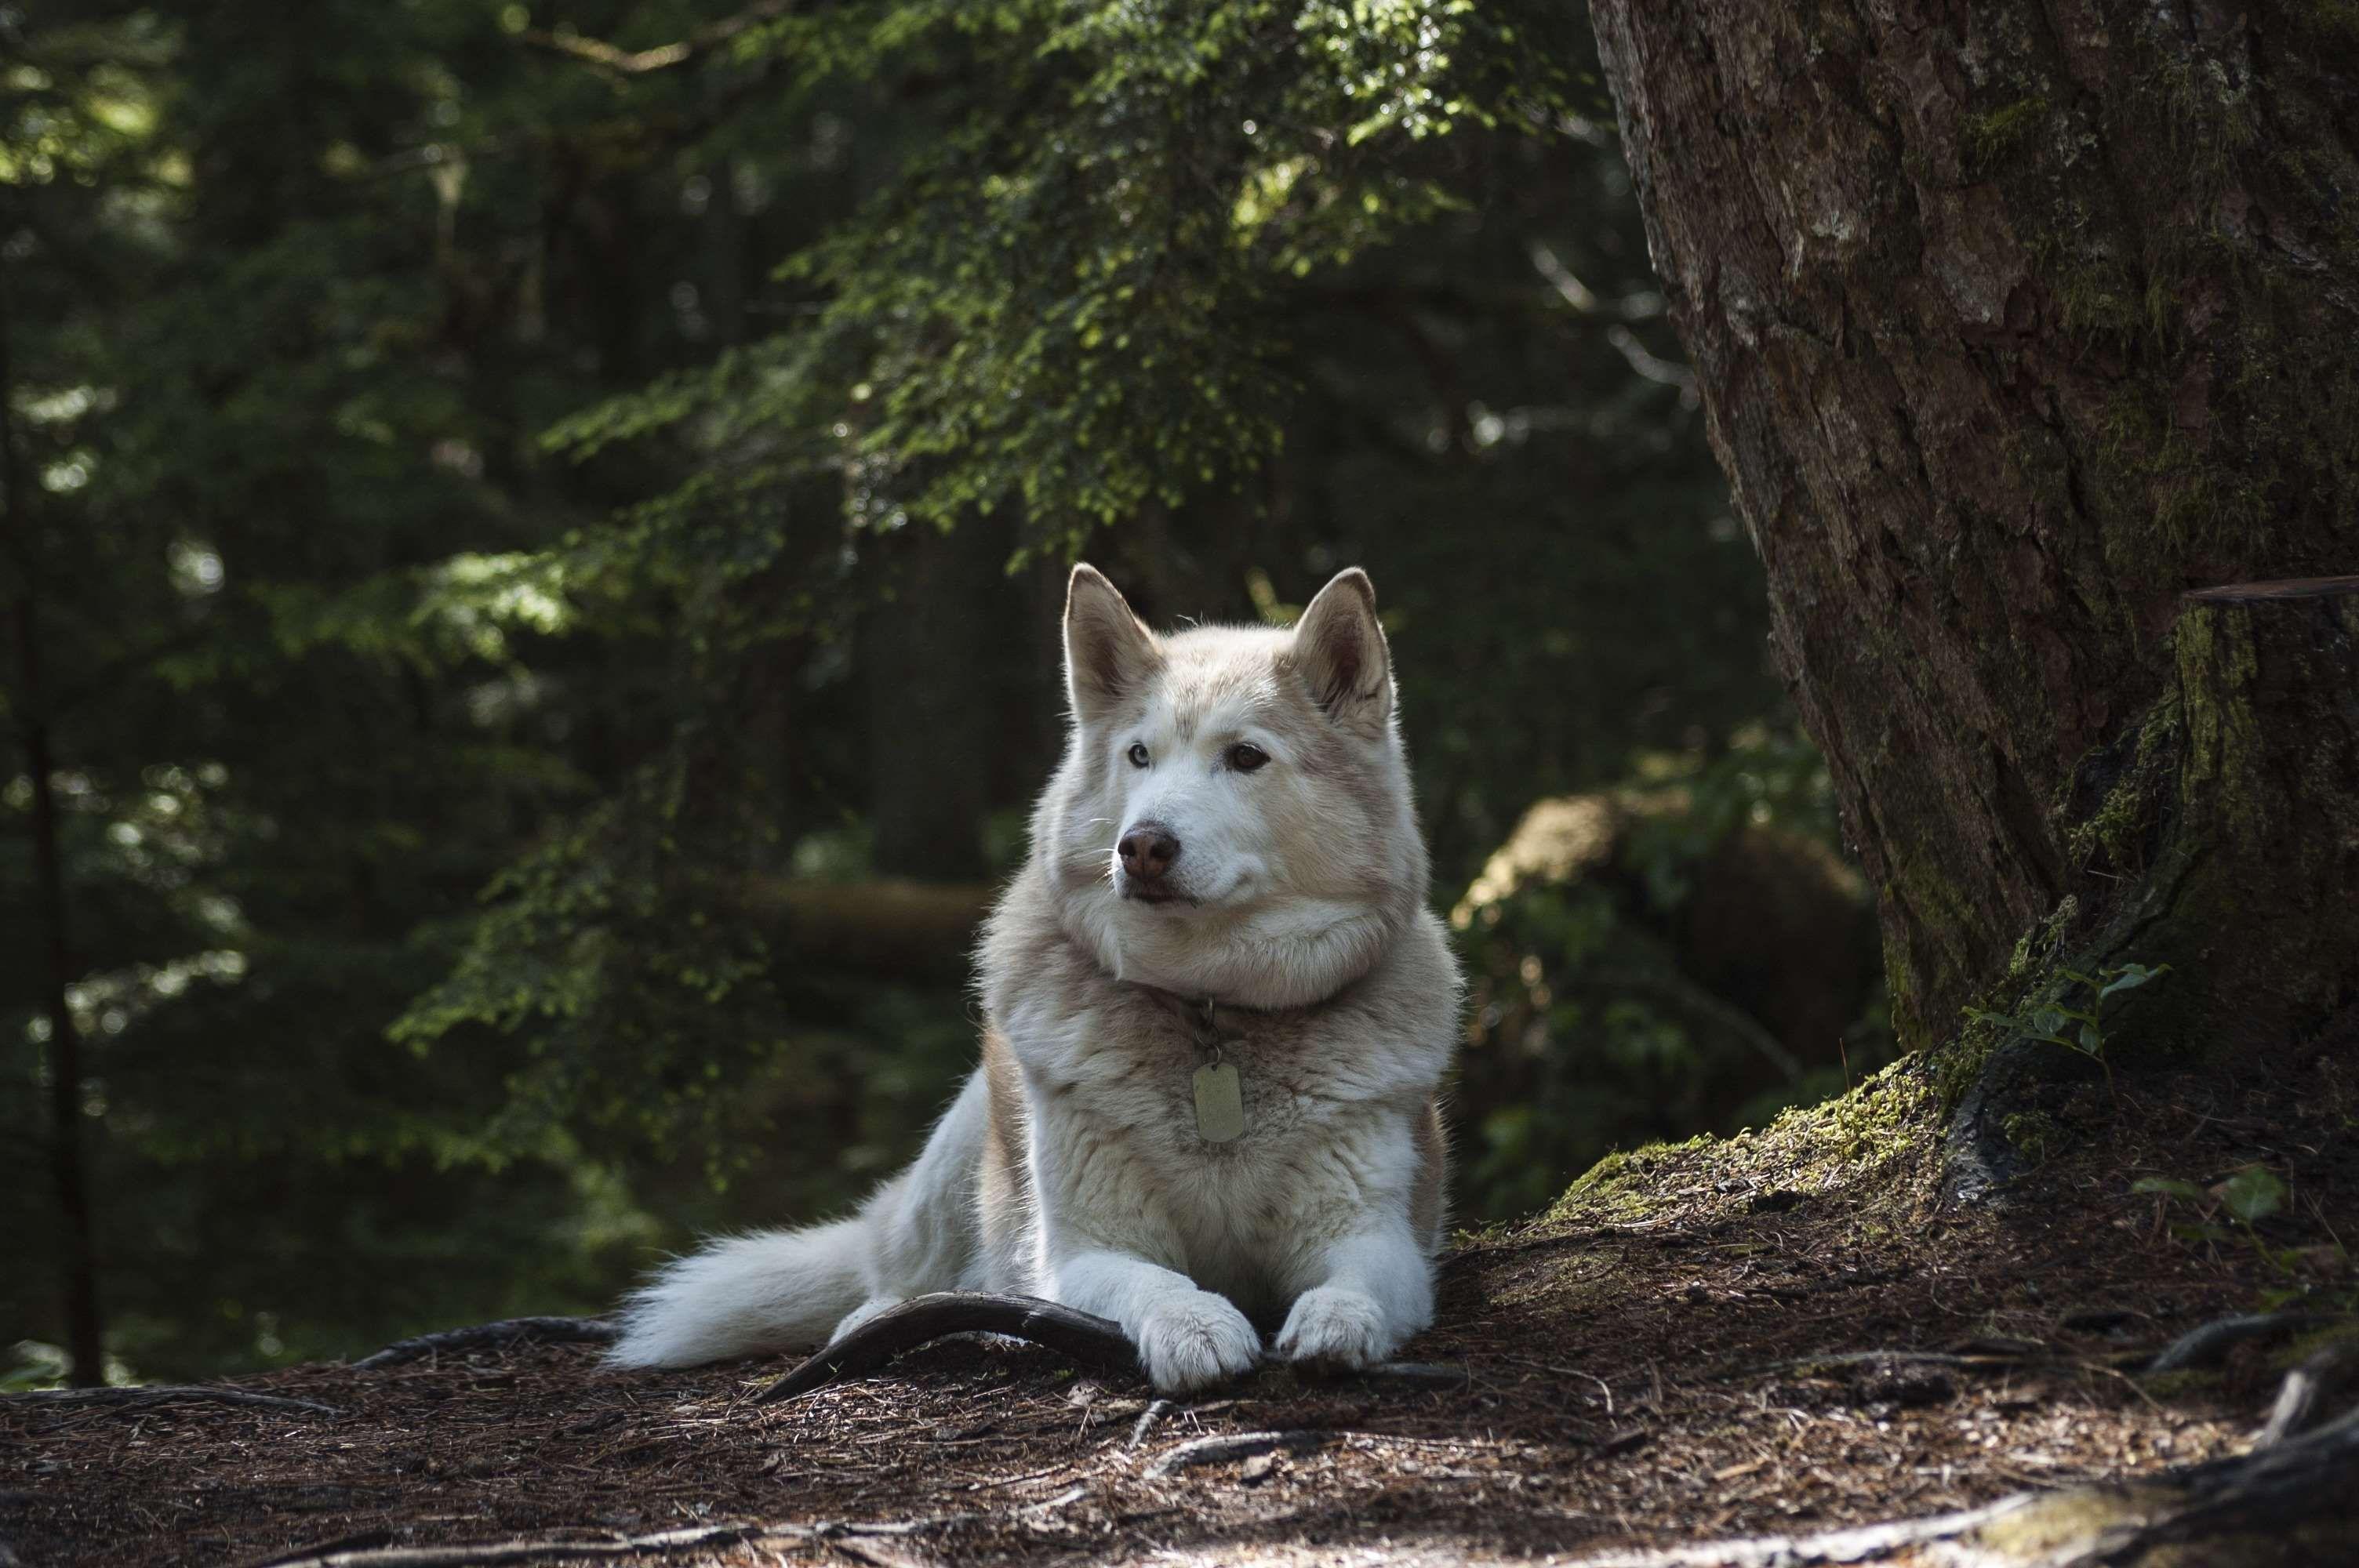 Great Fur Brown Adorable Dog - dd31cff3e6f785e20a41bbb8dcb2ea94  Trends_551494  .jpg